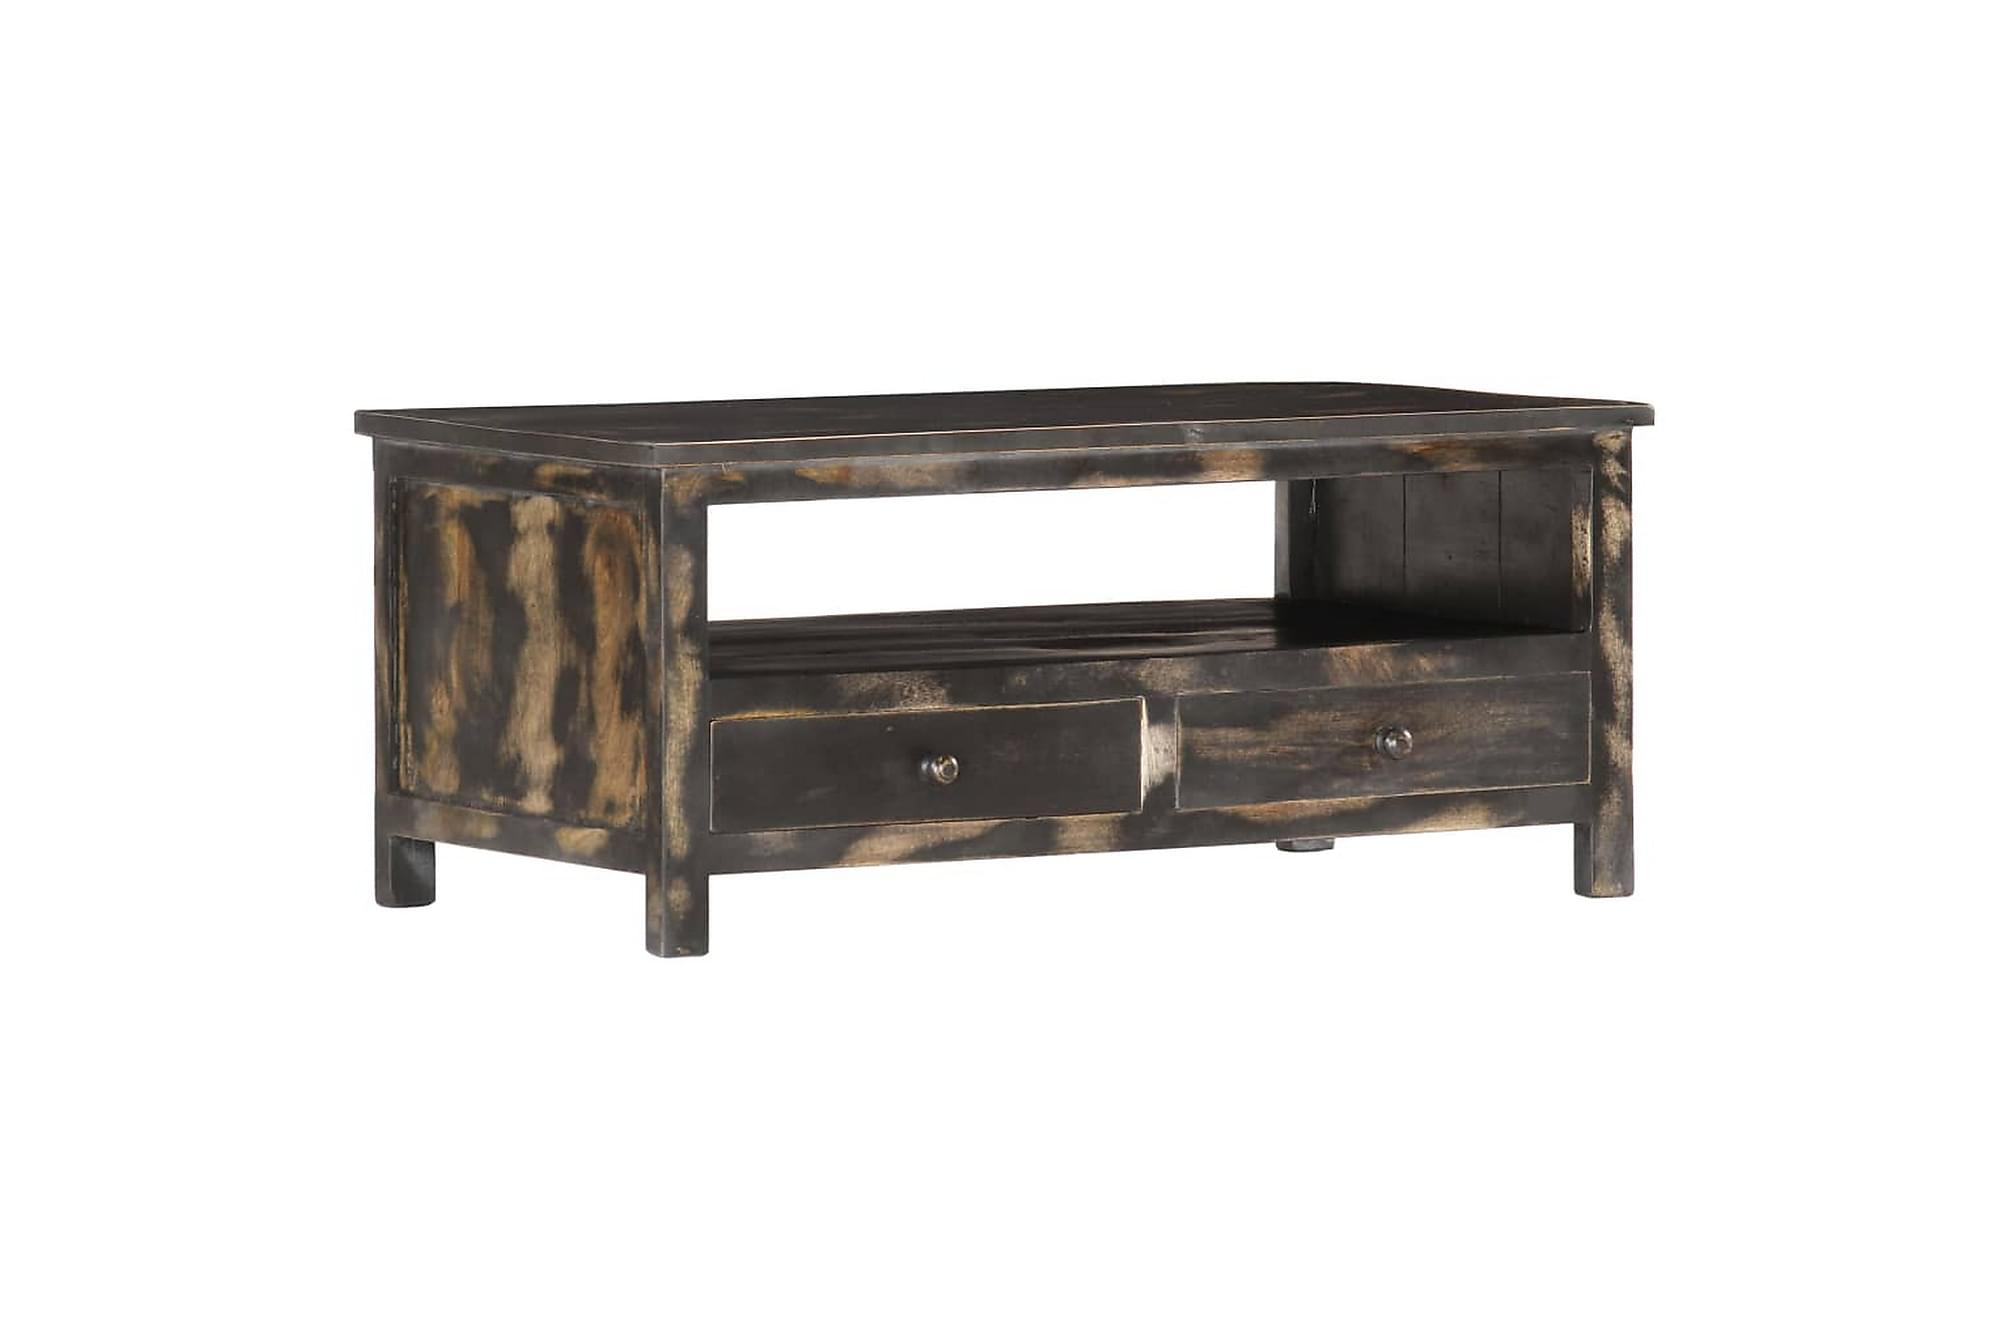 Soffbord svart 90x50x40 cm massivt mangoträ